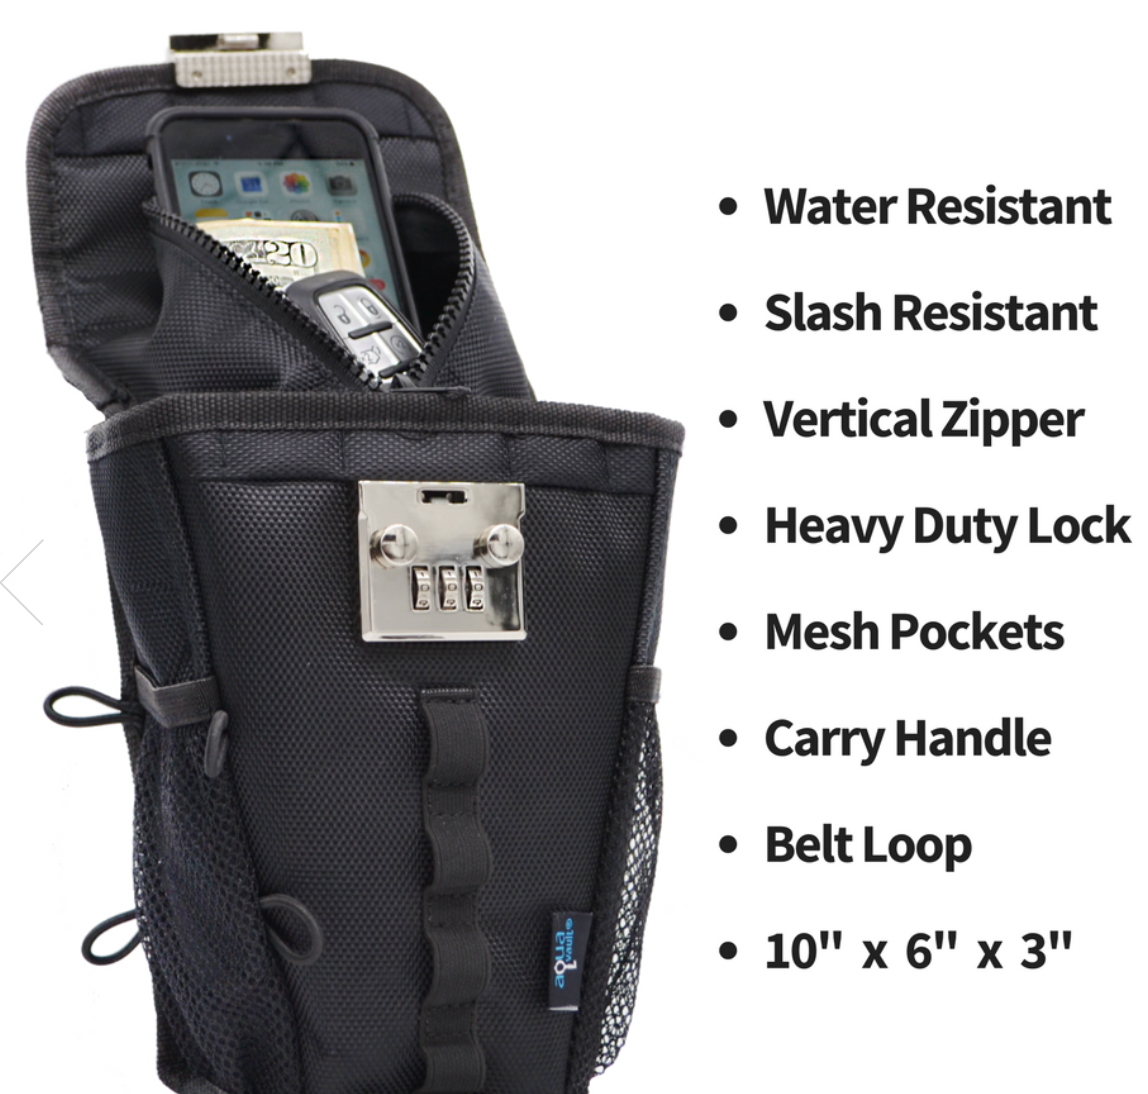 AquaVault Portable Safe - whatthegirlssay.com